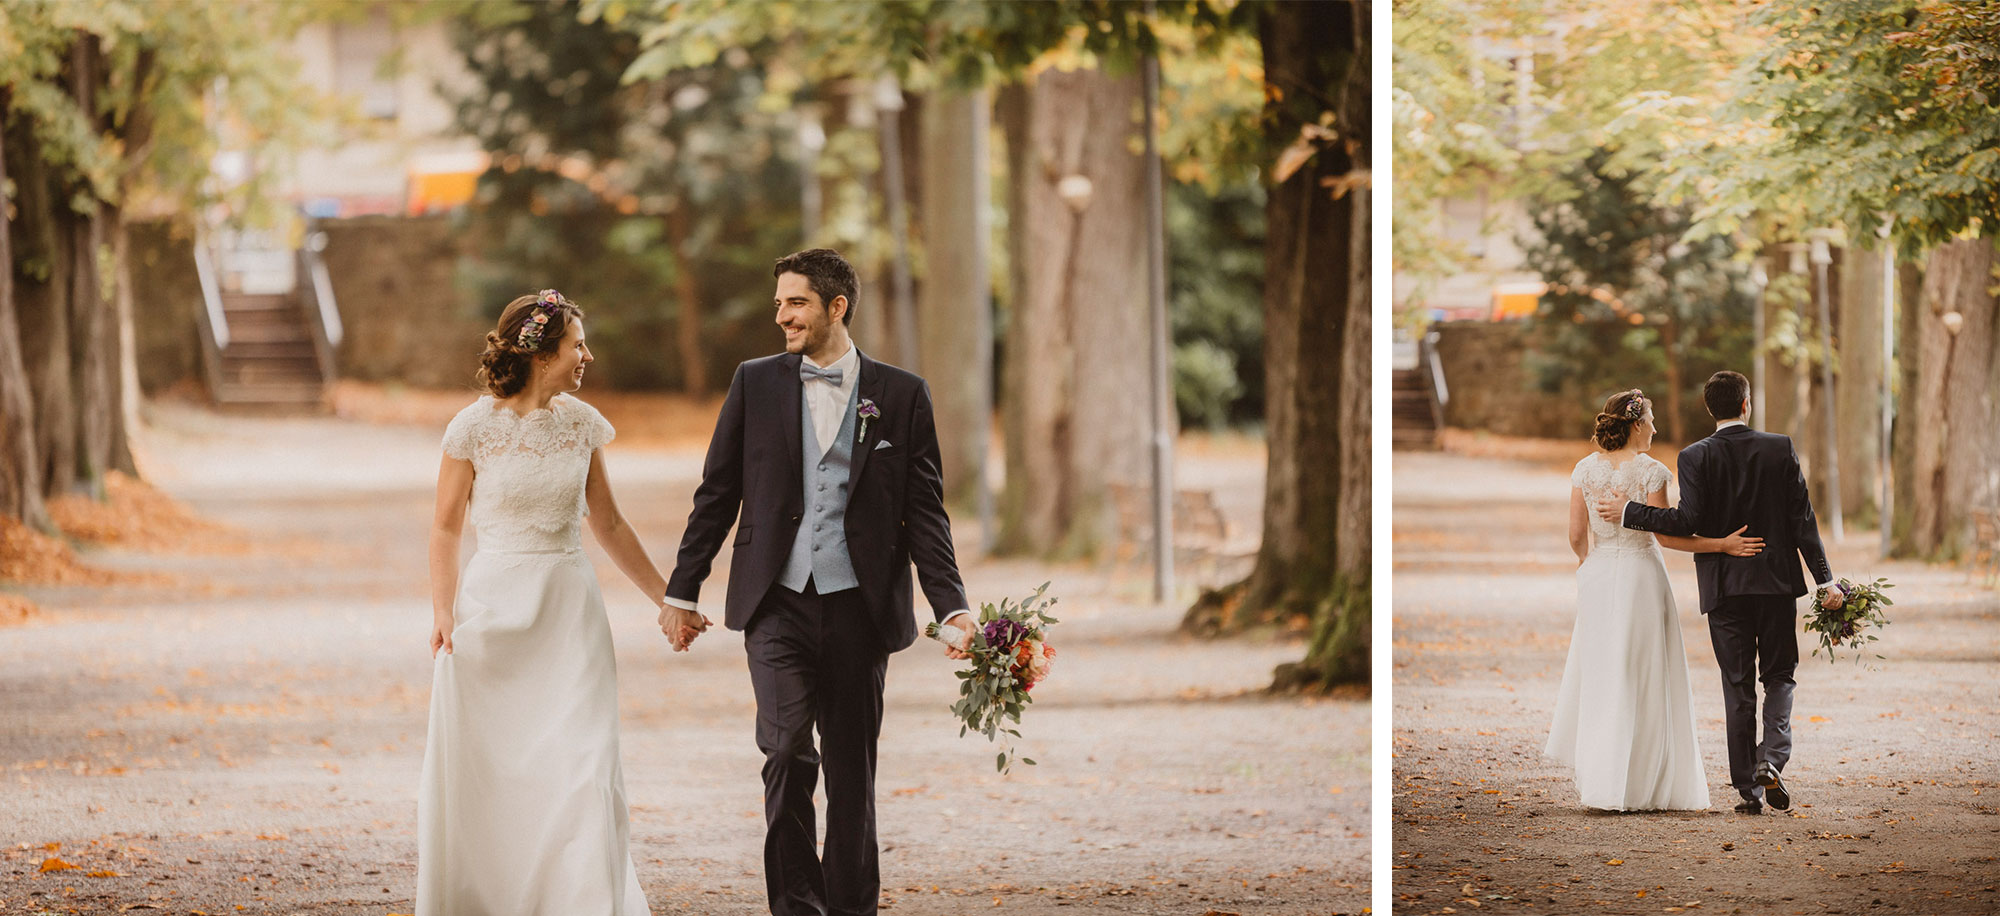 Hochzeitsfotografie-Karlsruhe-Ronja-Flo-34